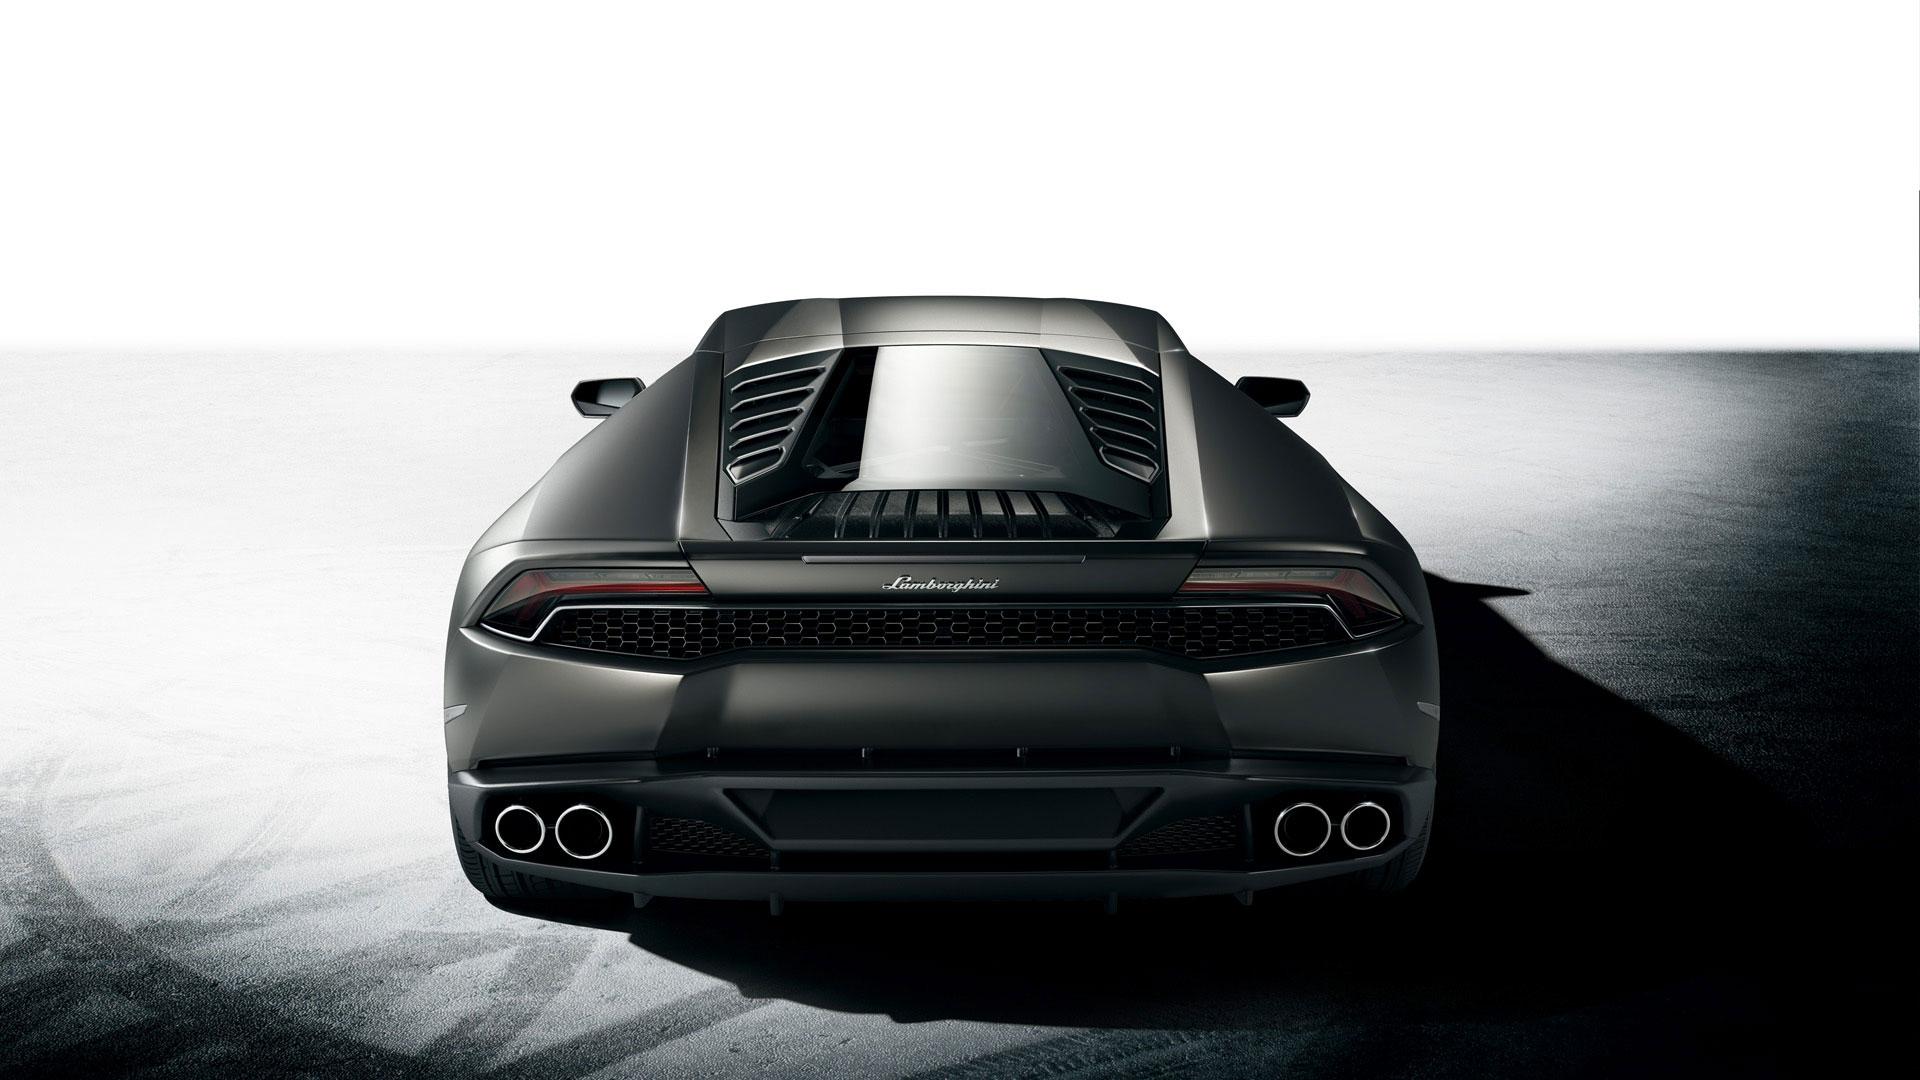 Lamborghini Huracan 2014 LP 610-4 Exterior